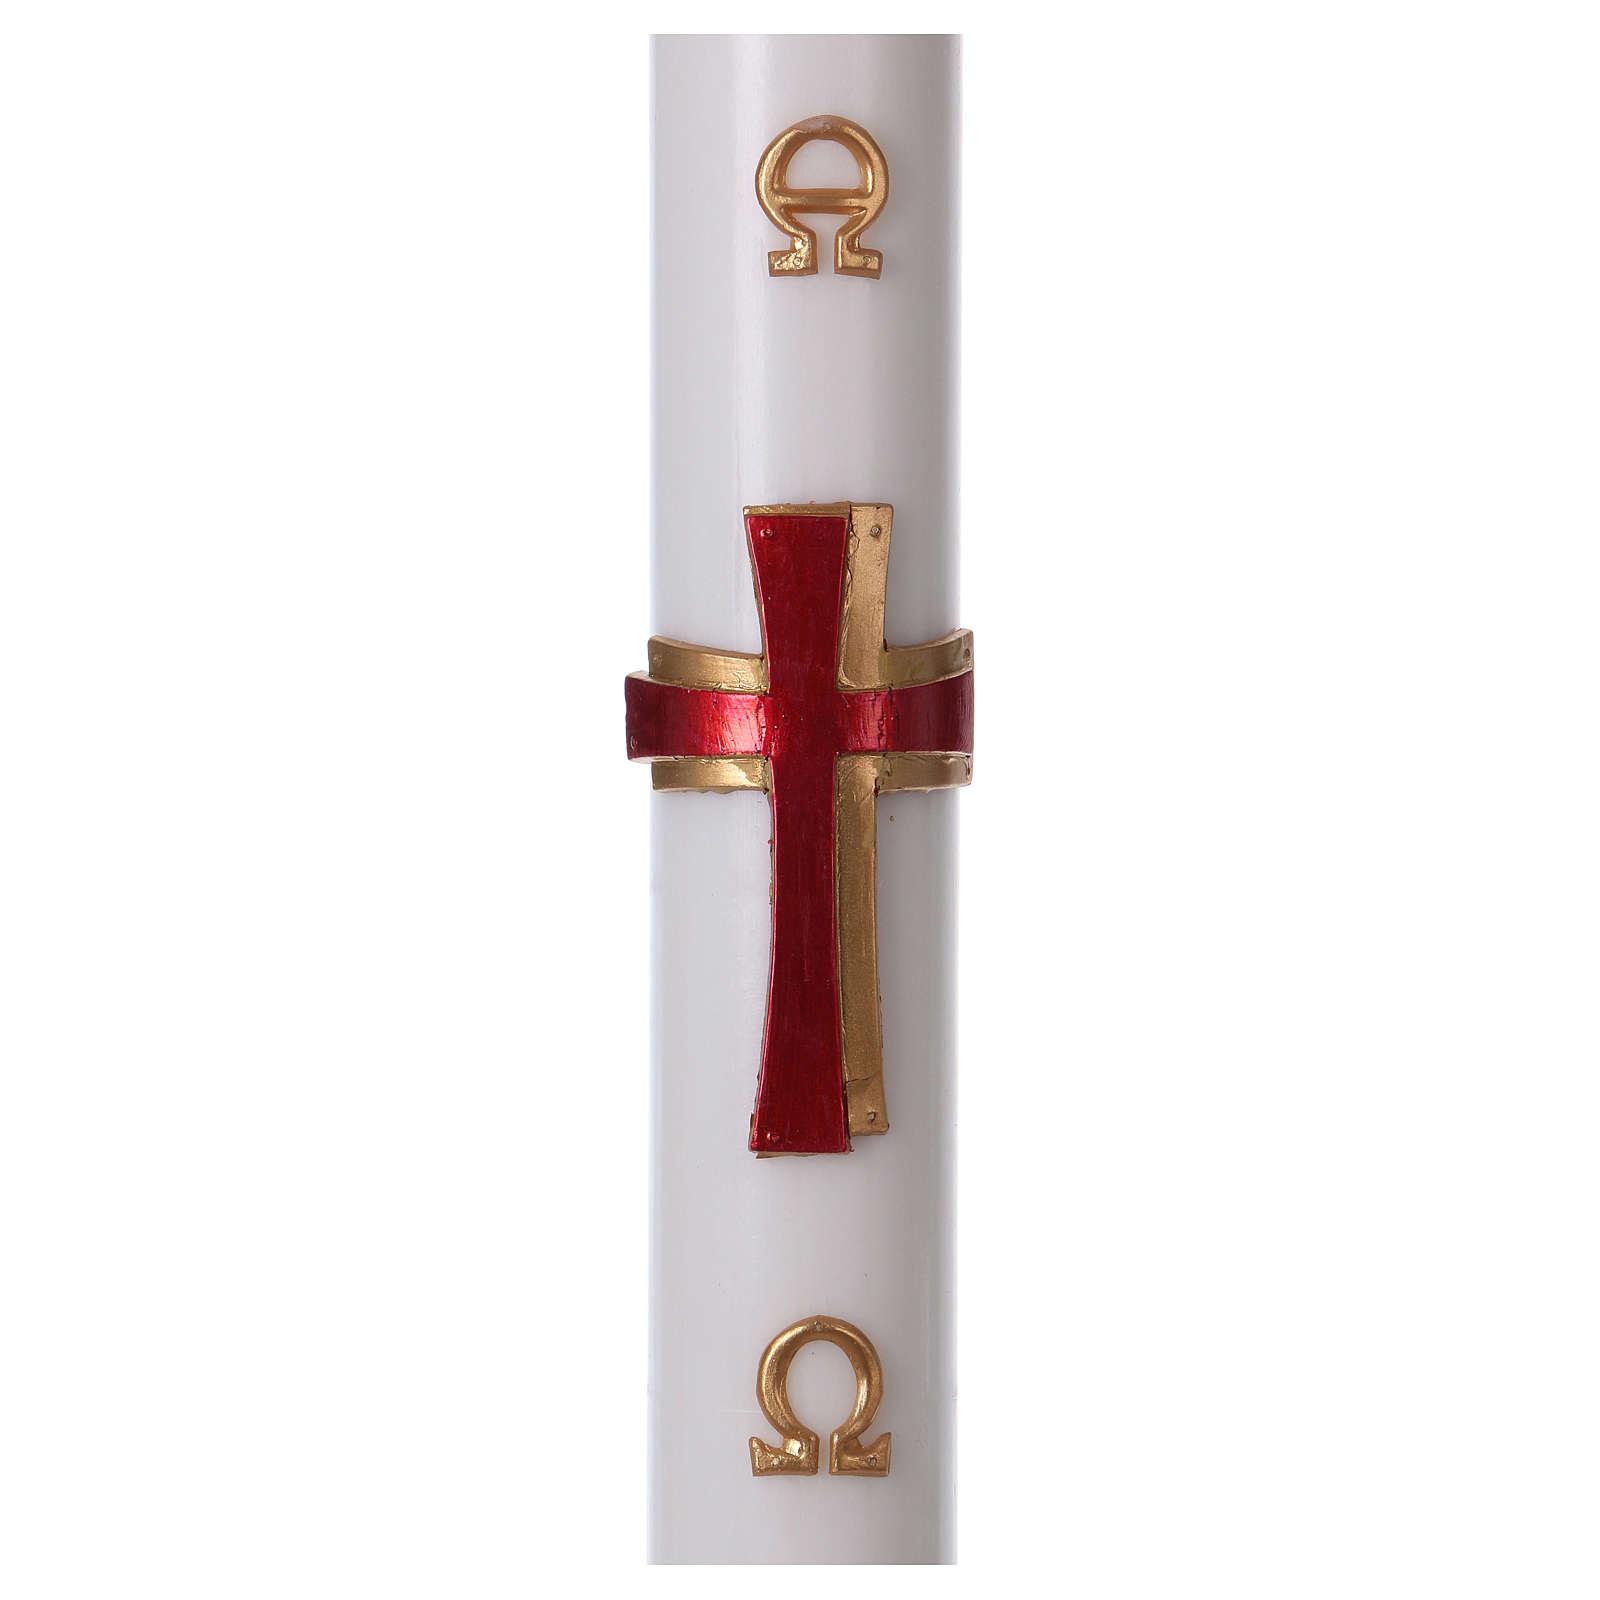 Cero pasquale cera bianca RINFORZO Croce rilievo rossa 8x120 cm 3